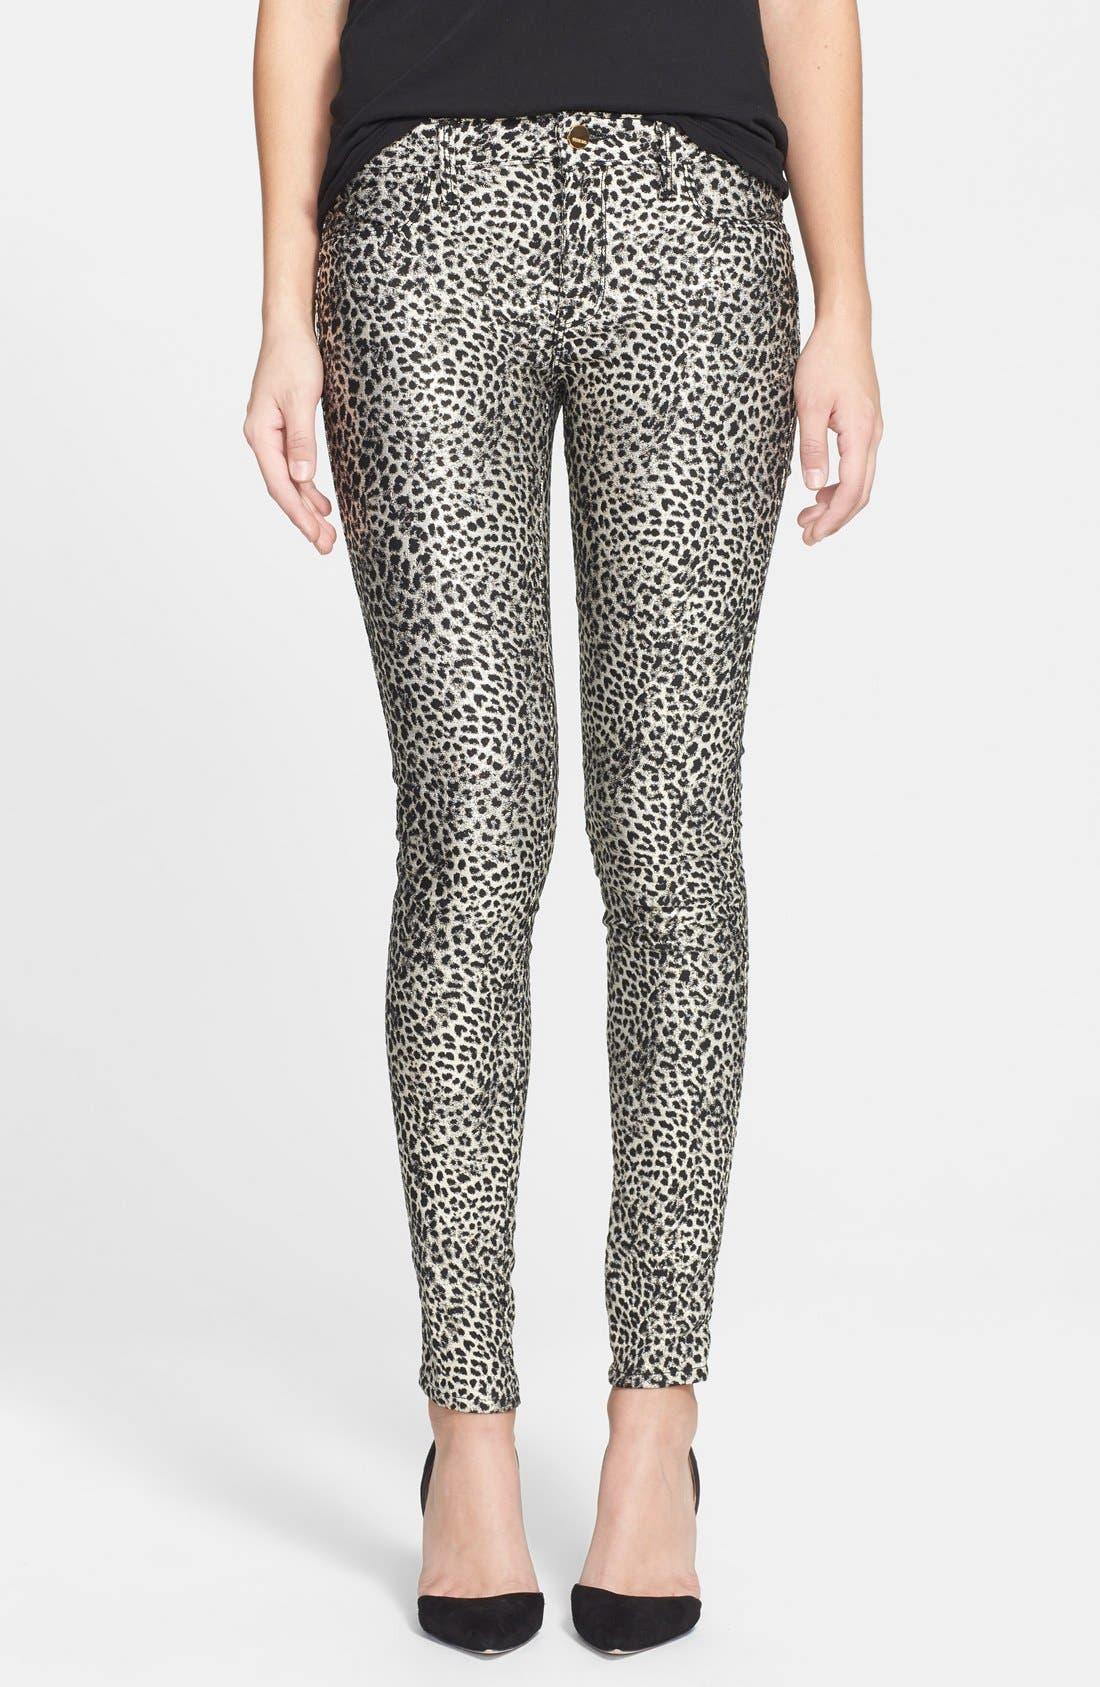 GENETIC 'Shane Skinny' Coated Skinny Jeans, Main, color, 250